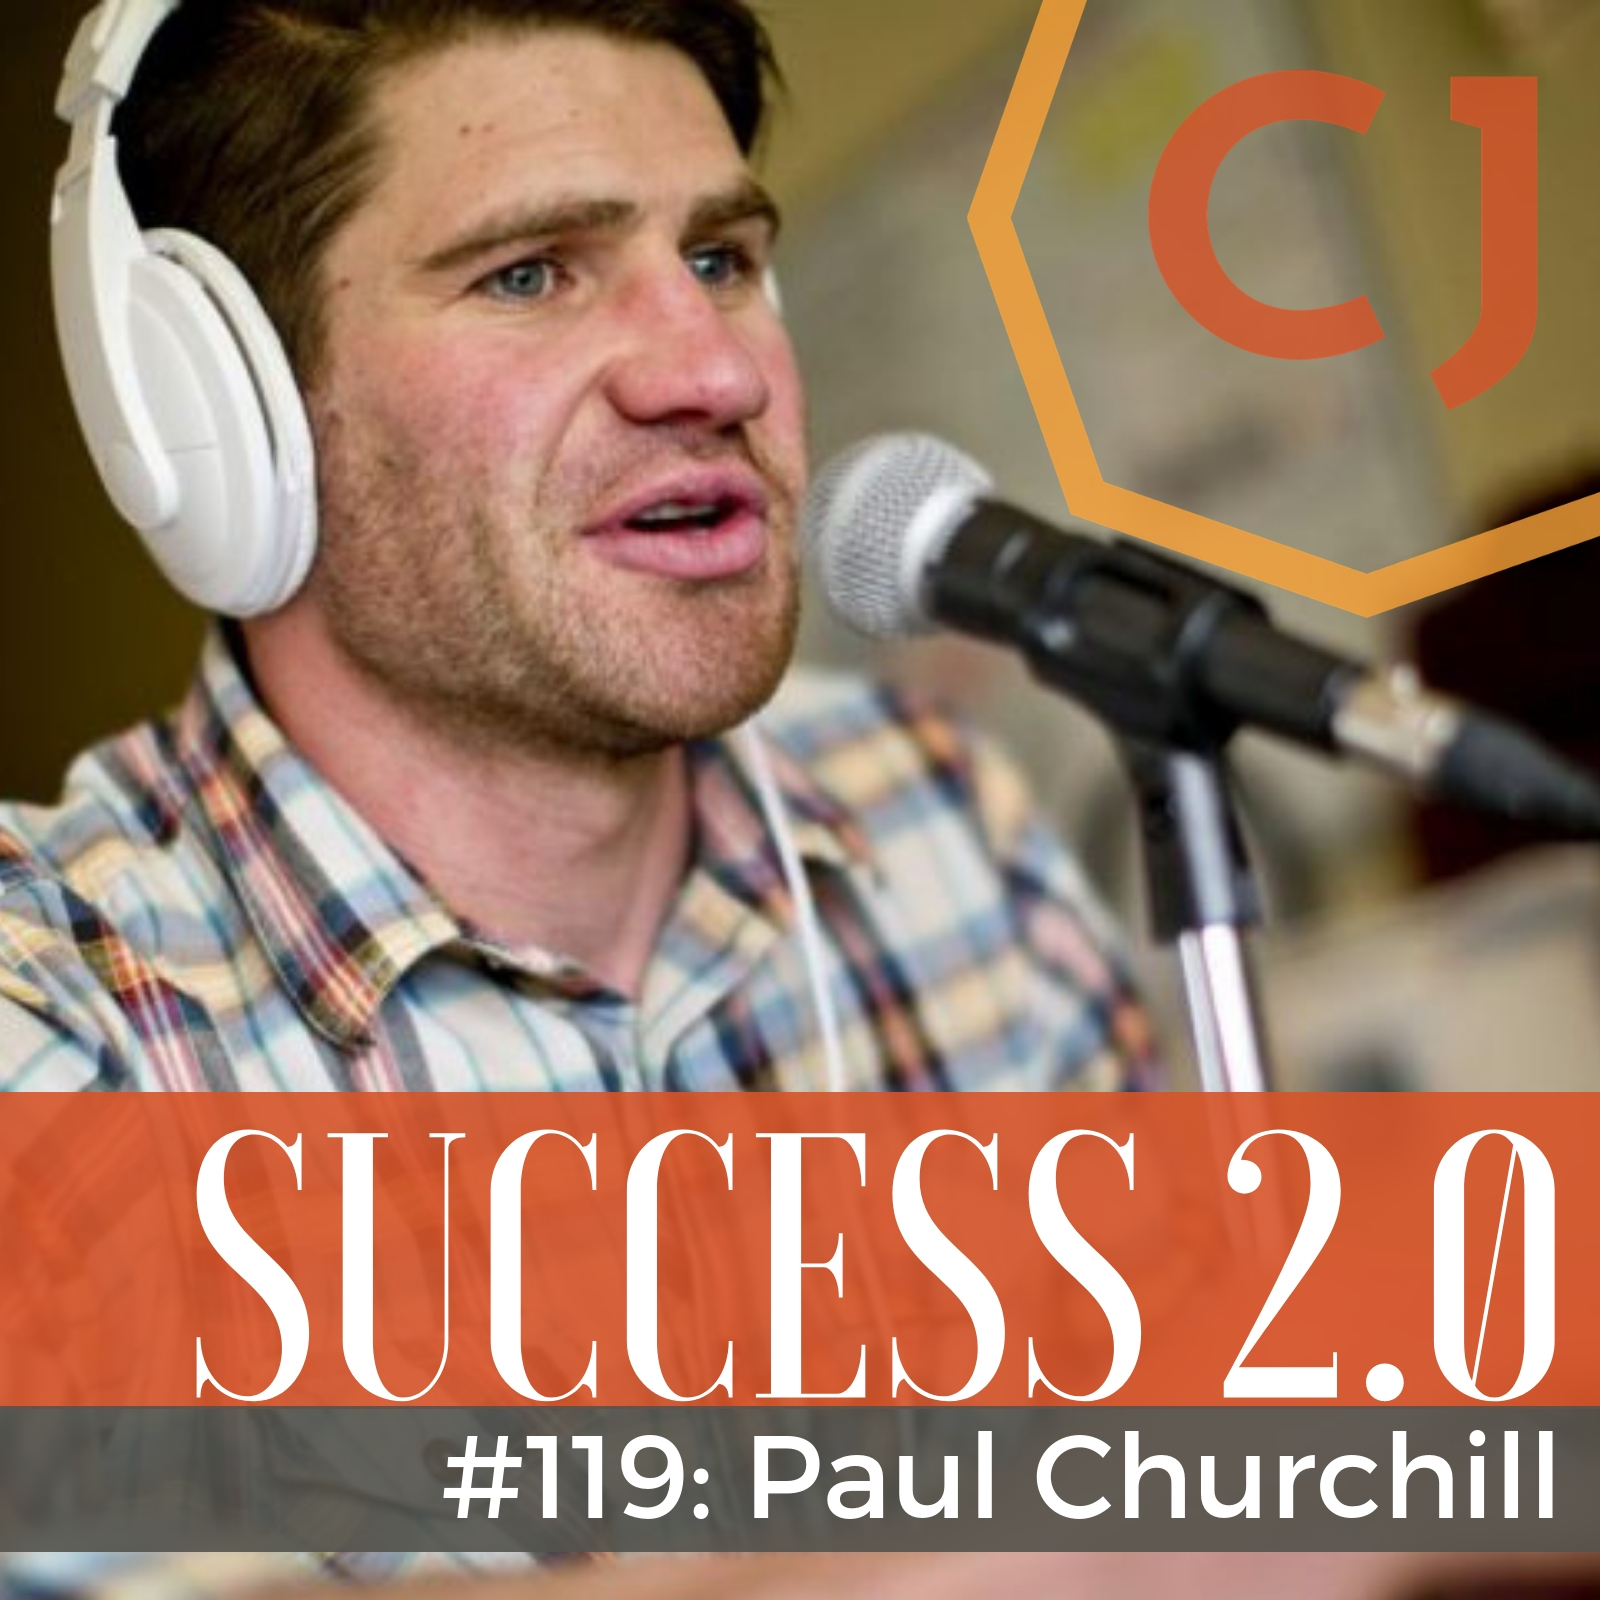 Success-2.0-119-Paul-Churchill-Recovery-Elevator-